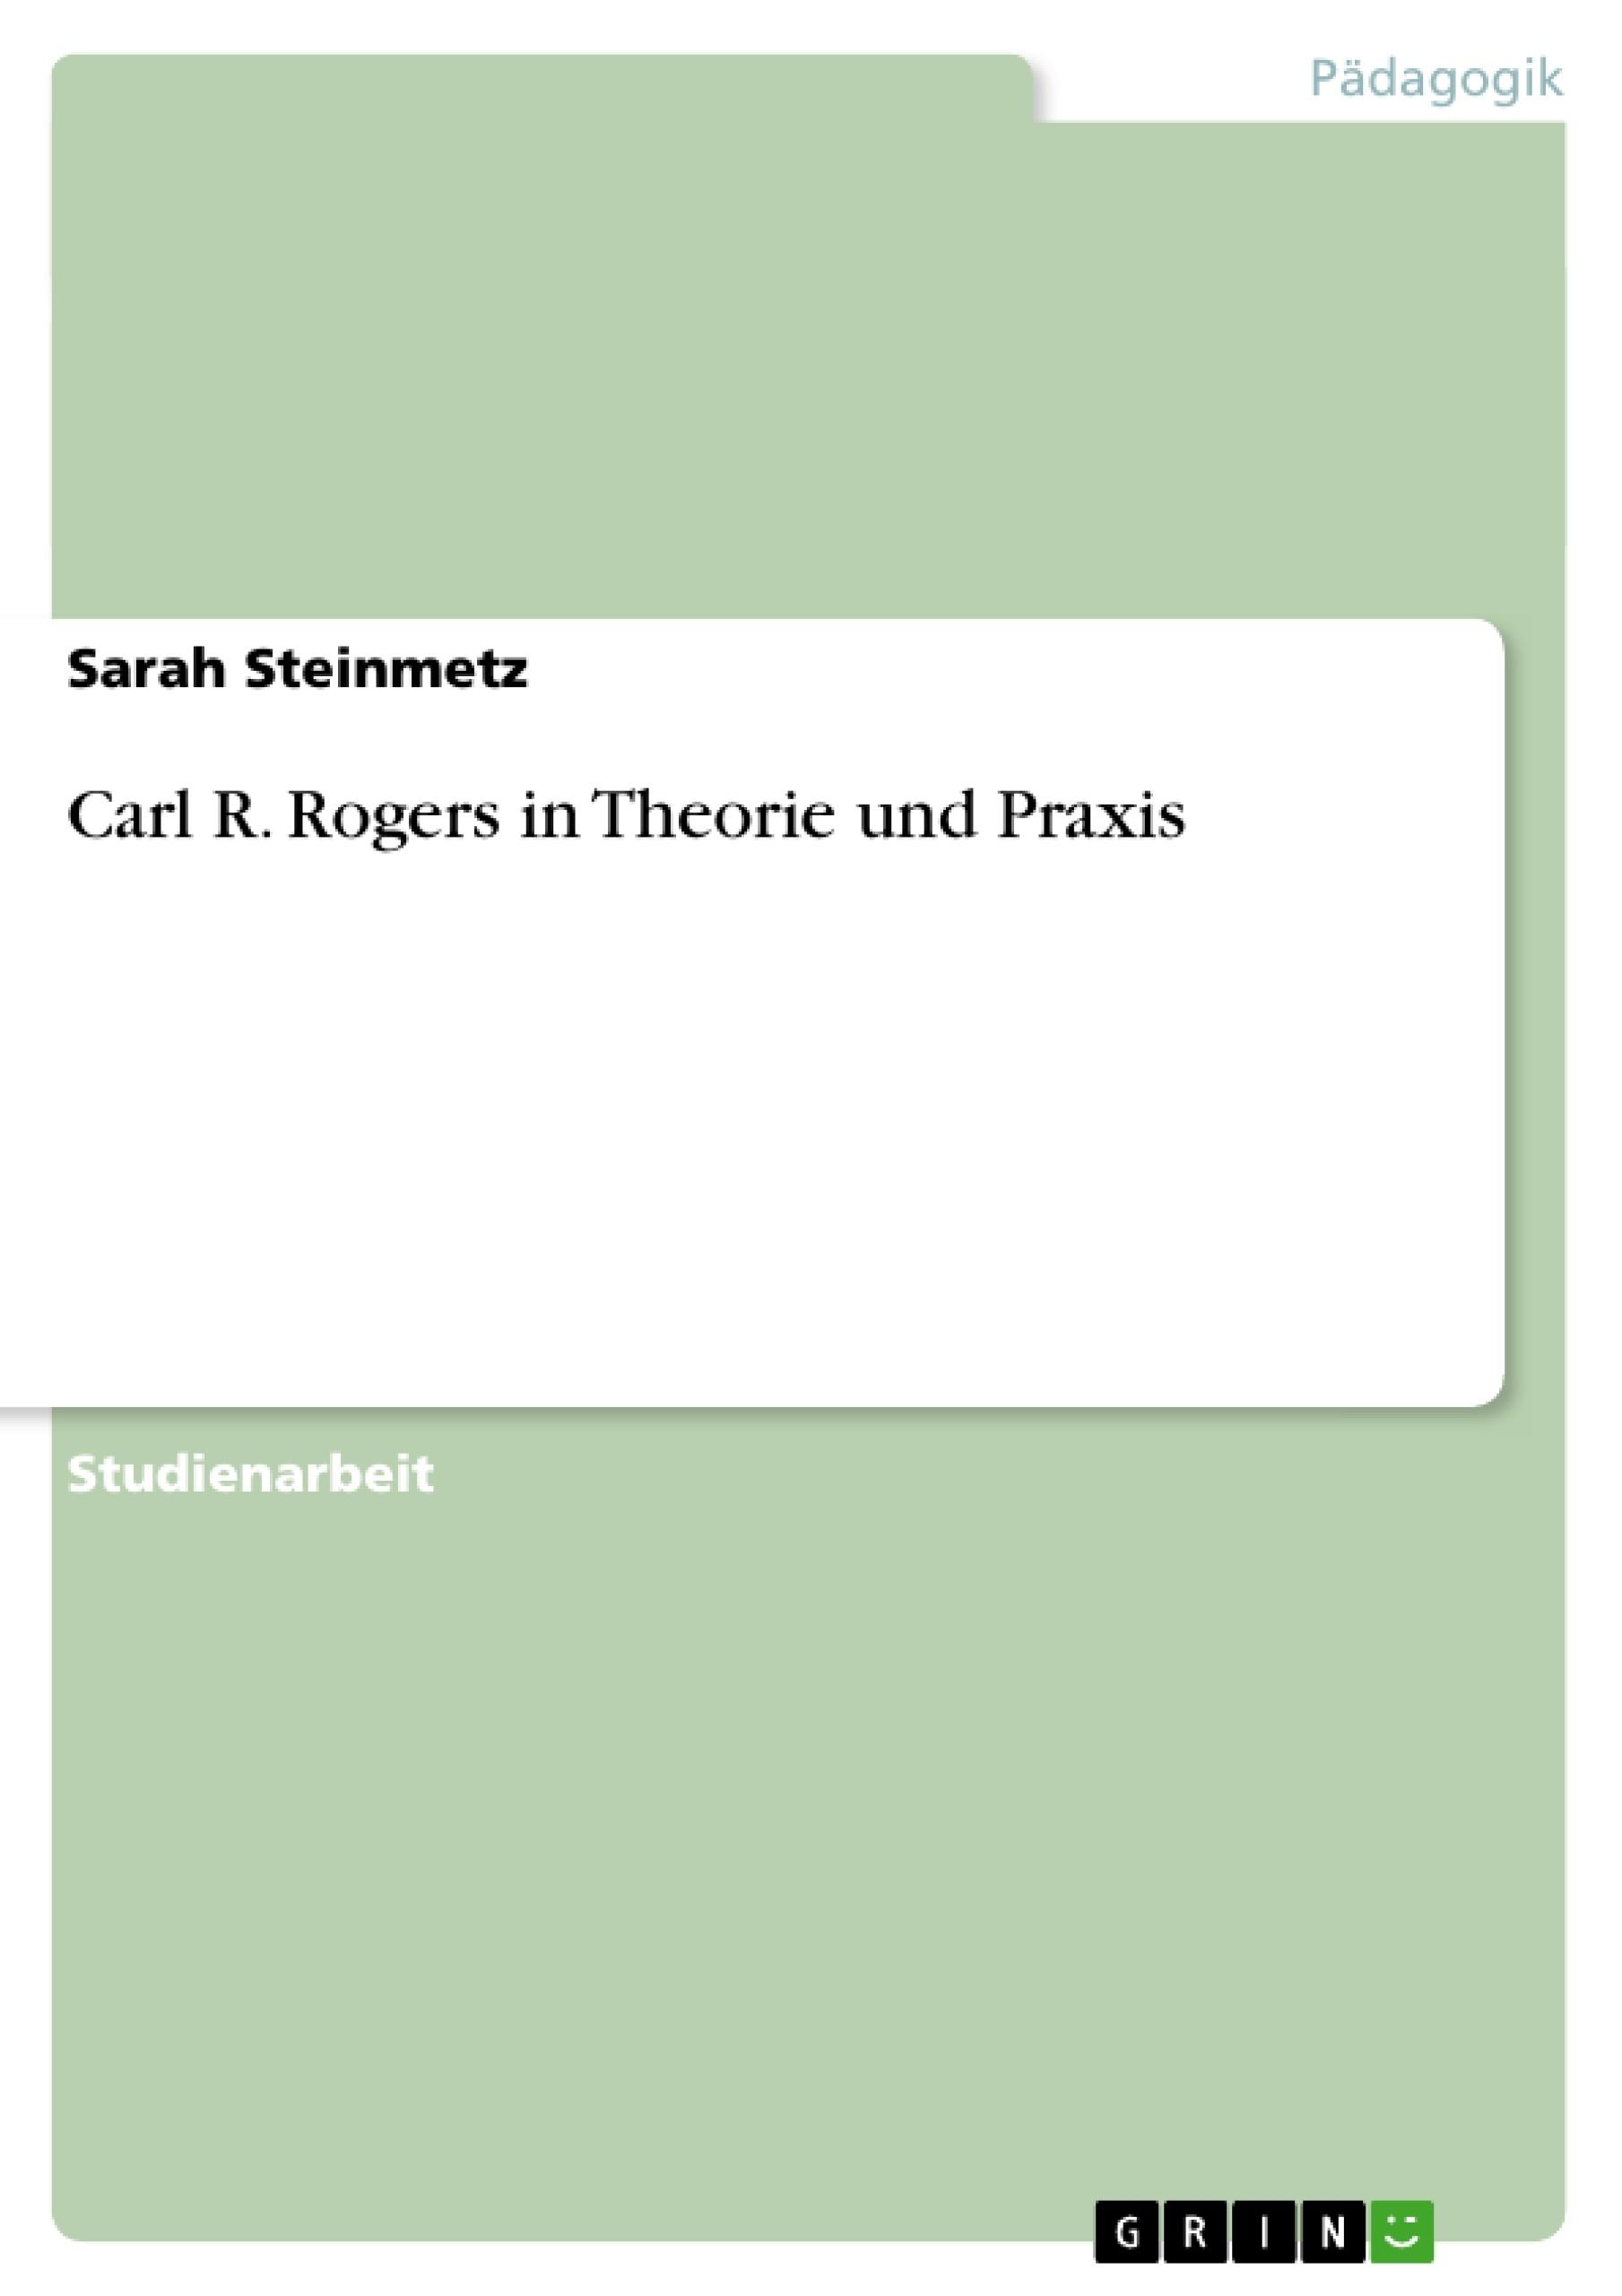 Titel: Carl R. Rogers in Theorie und Praxis